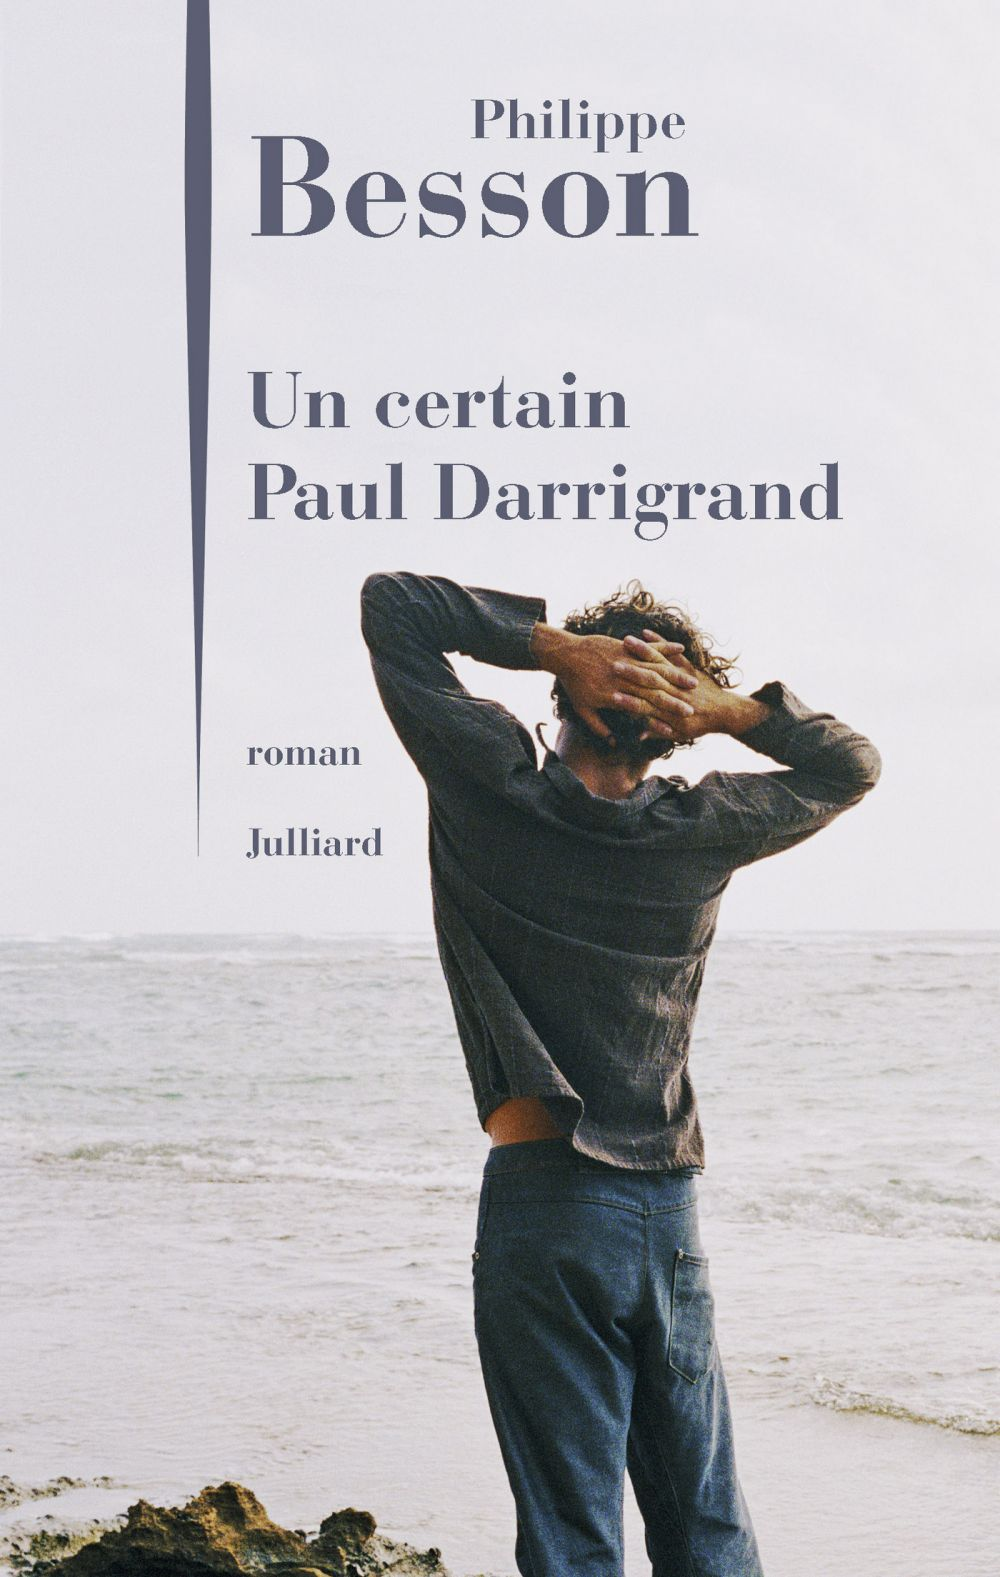 Un certain Paul Darrigrand | BESSON, Philippe. Auteur